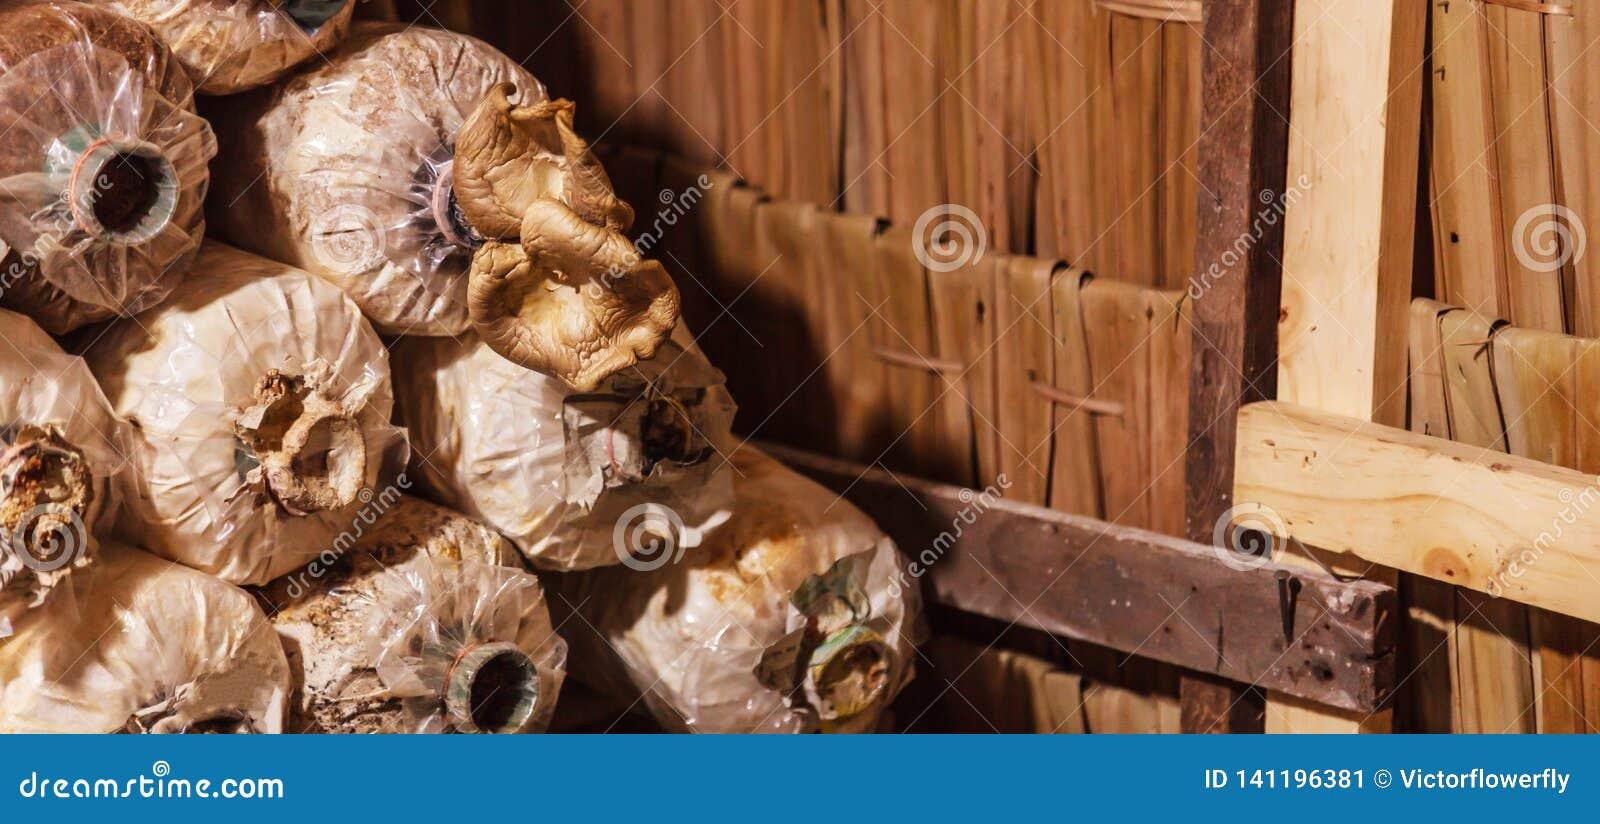 Cultivation And Harvesting Mushrooms In Mushroom Food